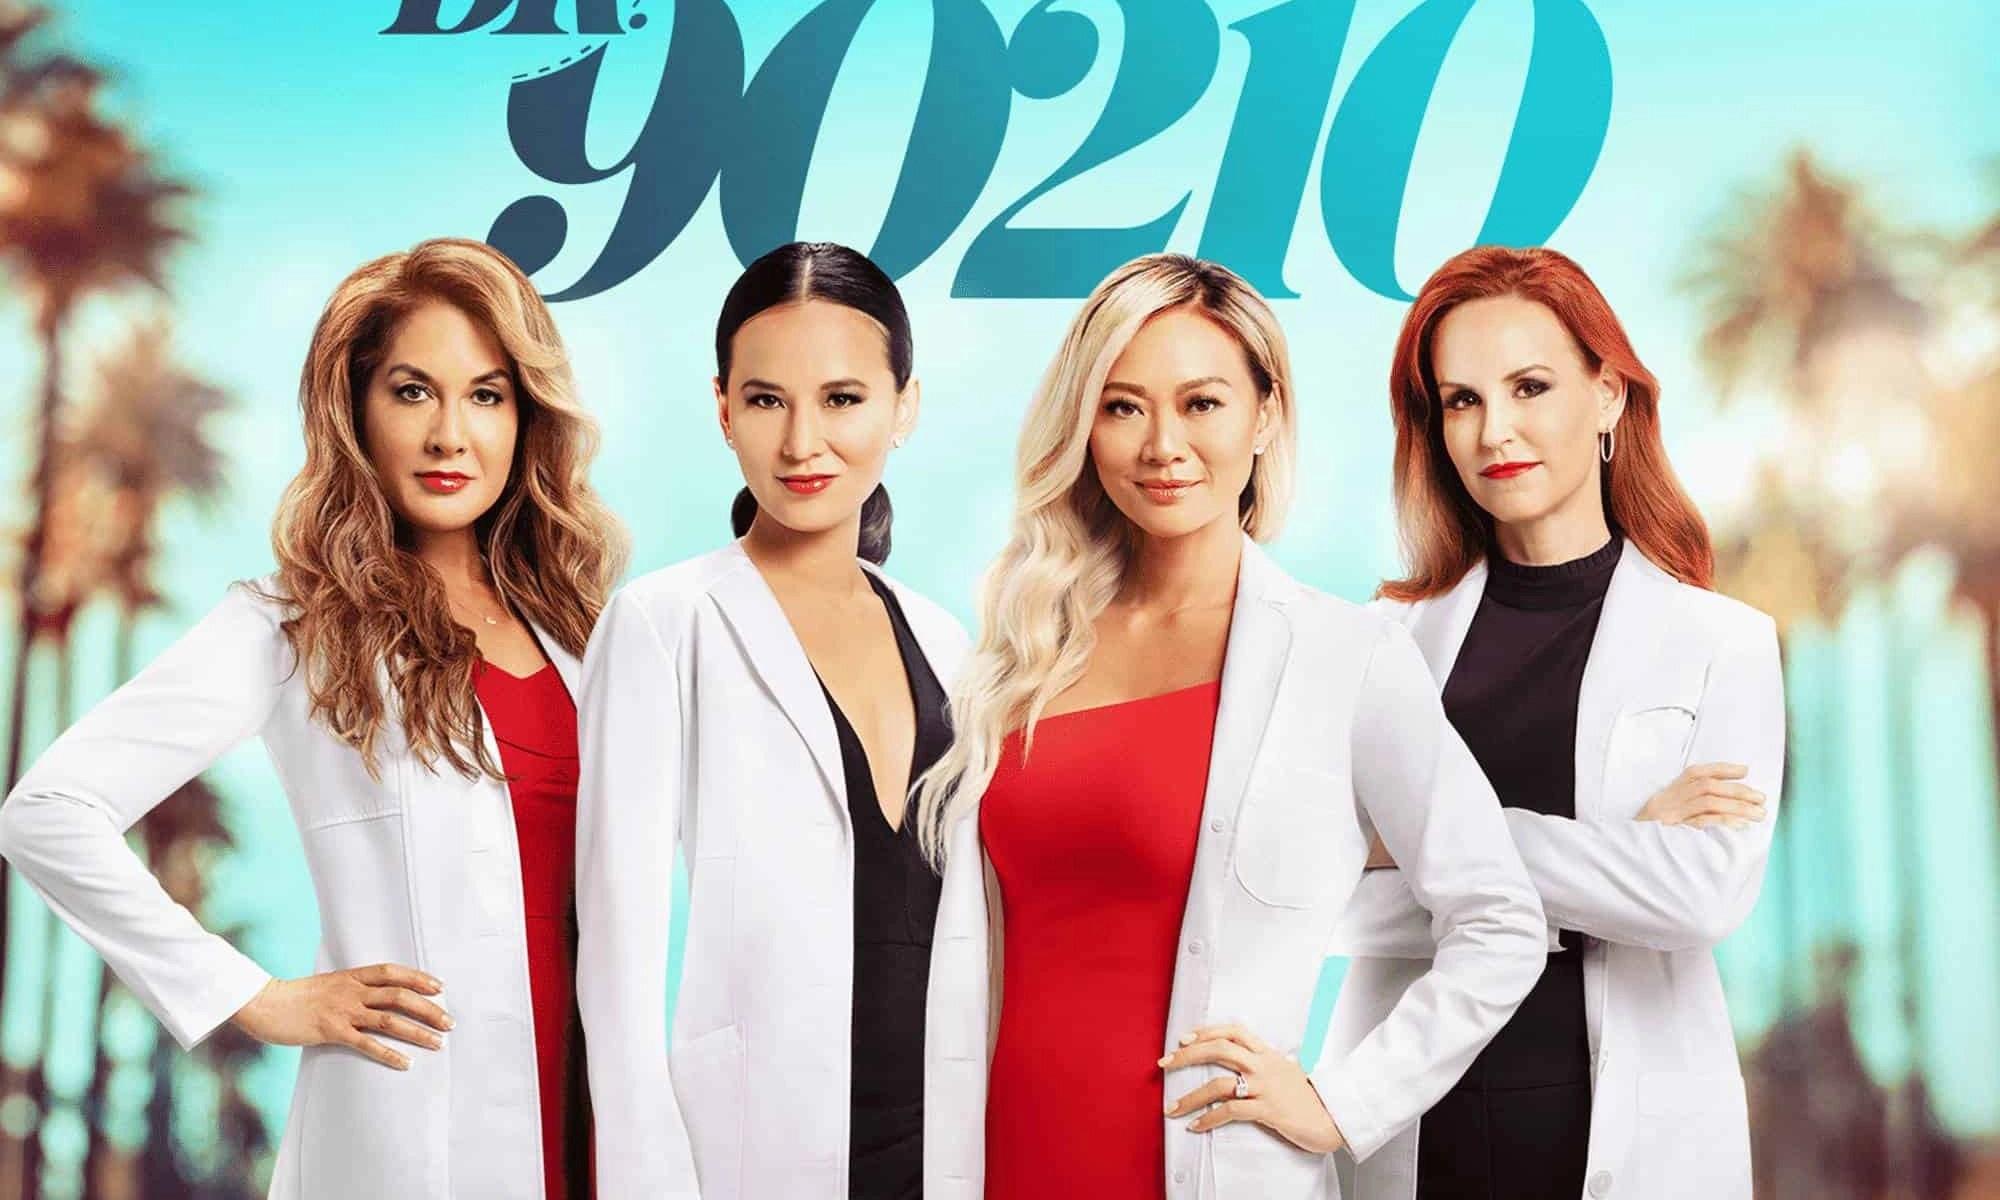 Dr. 90210 promo